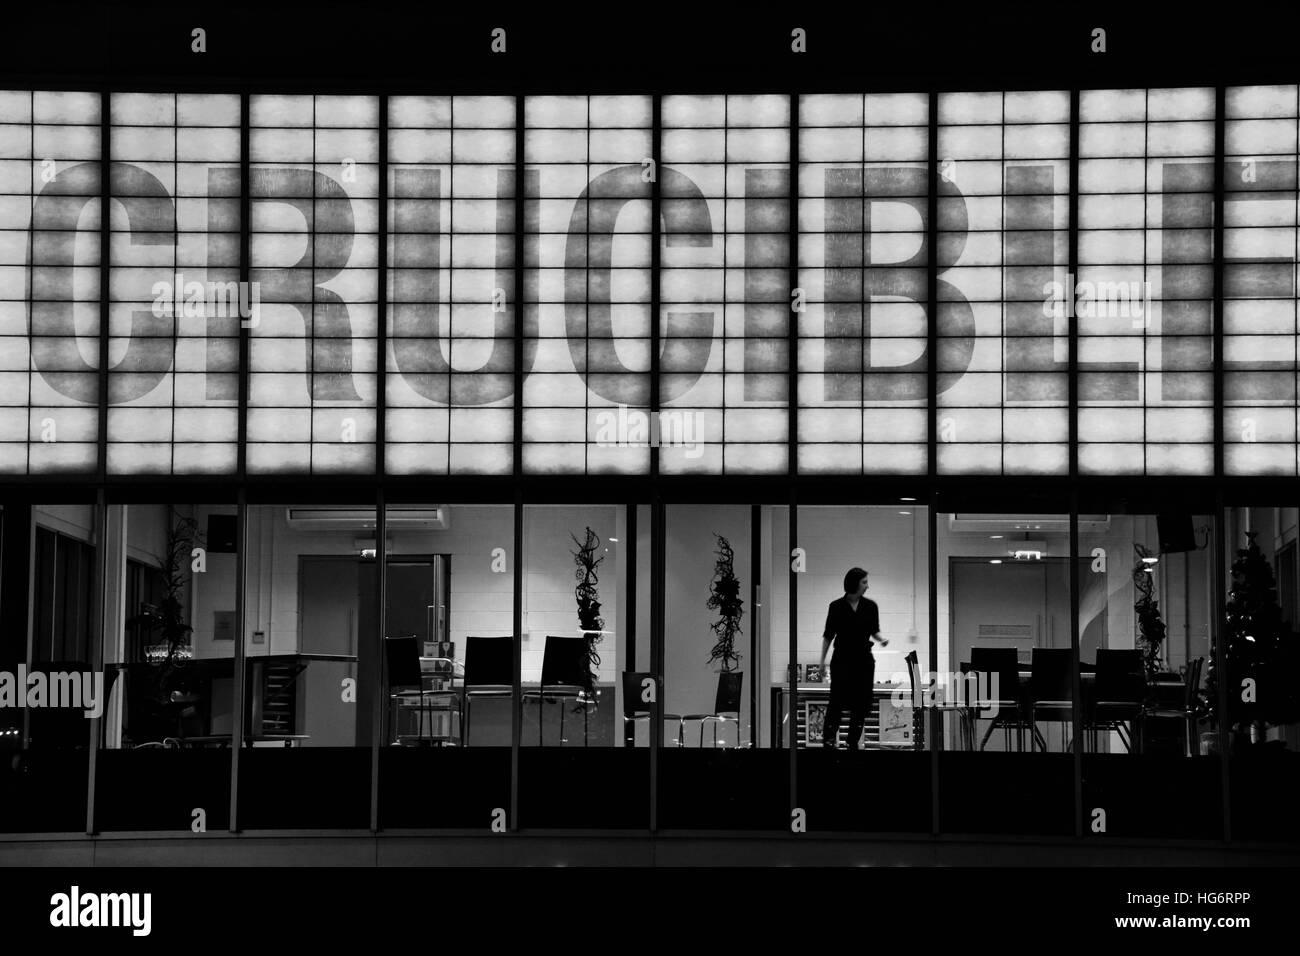 The Crucible Theatre, Sheffield, UK - Stock Image